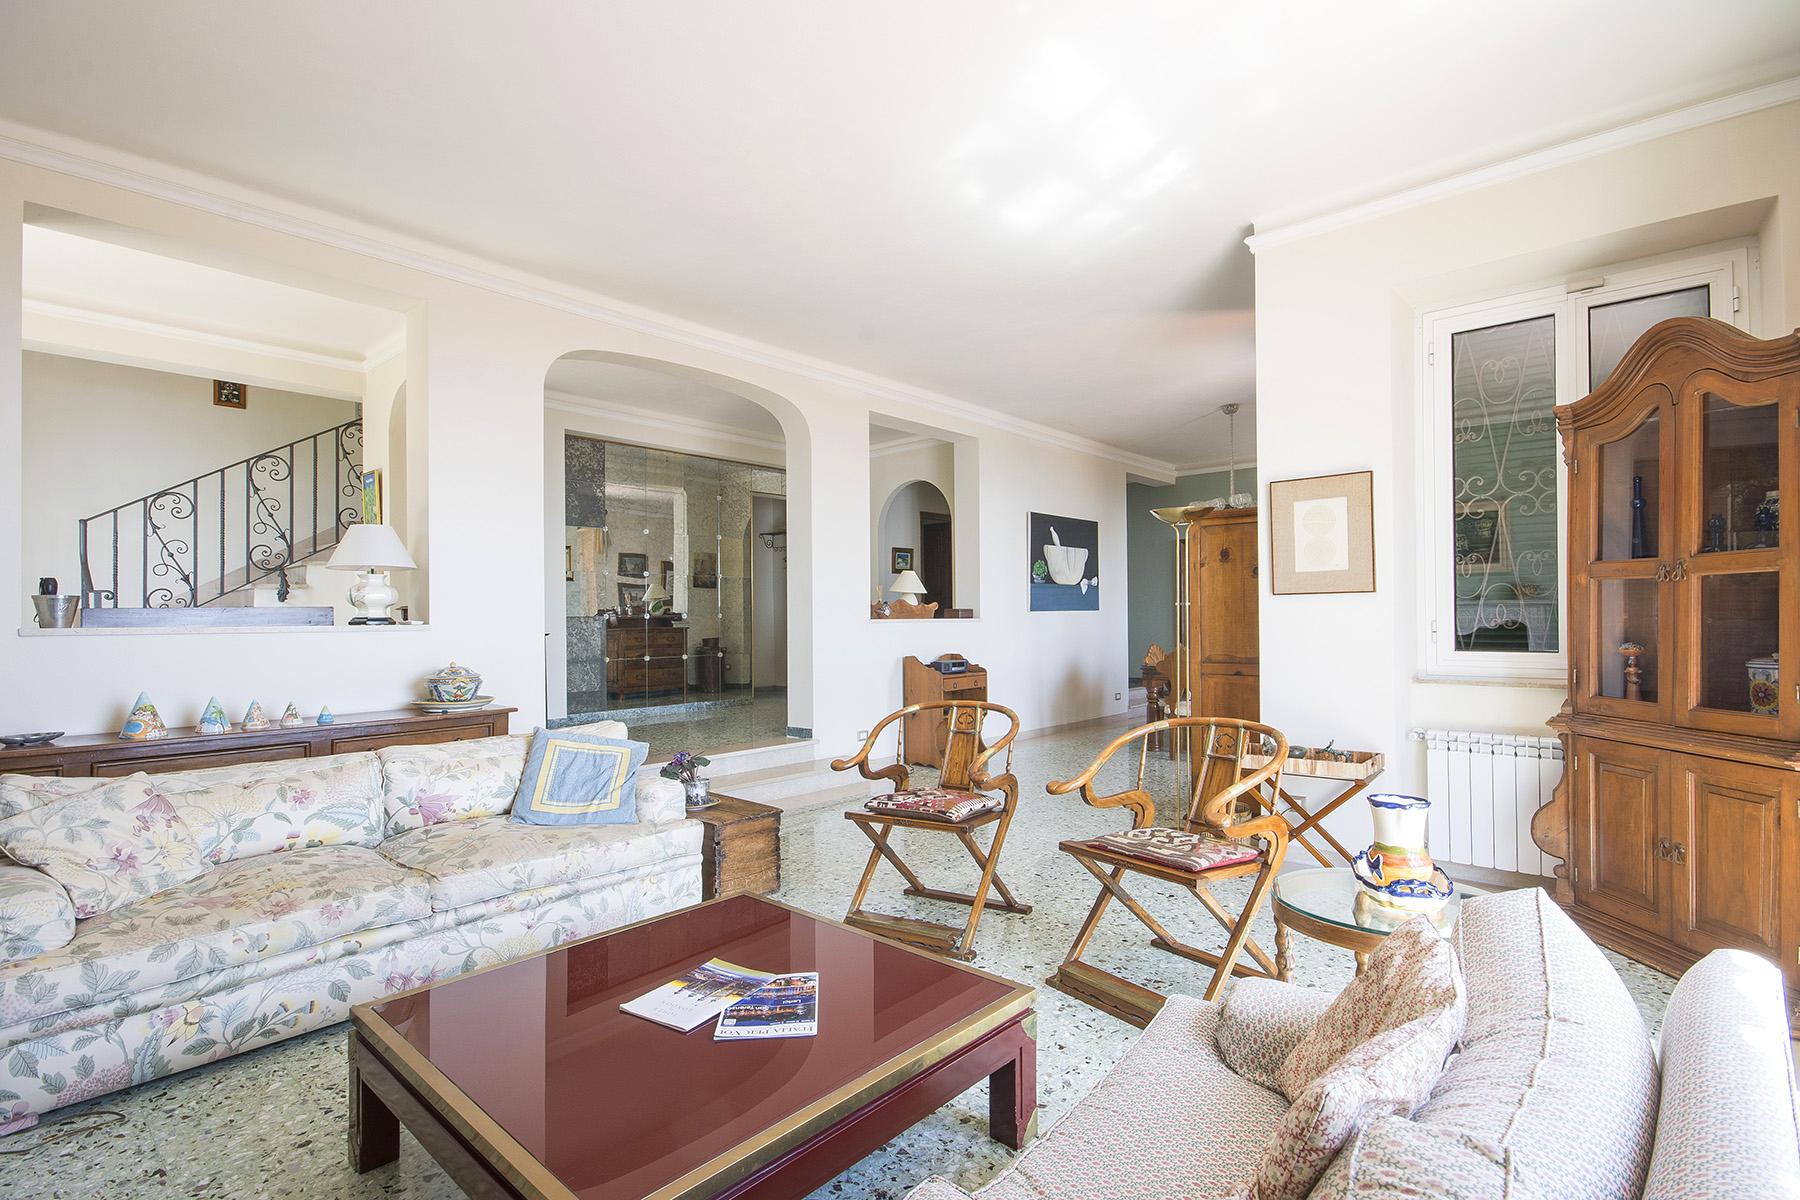 Villa in Vendita a Lerici: 5 locali, 580 mq - Foto 6